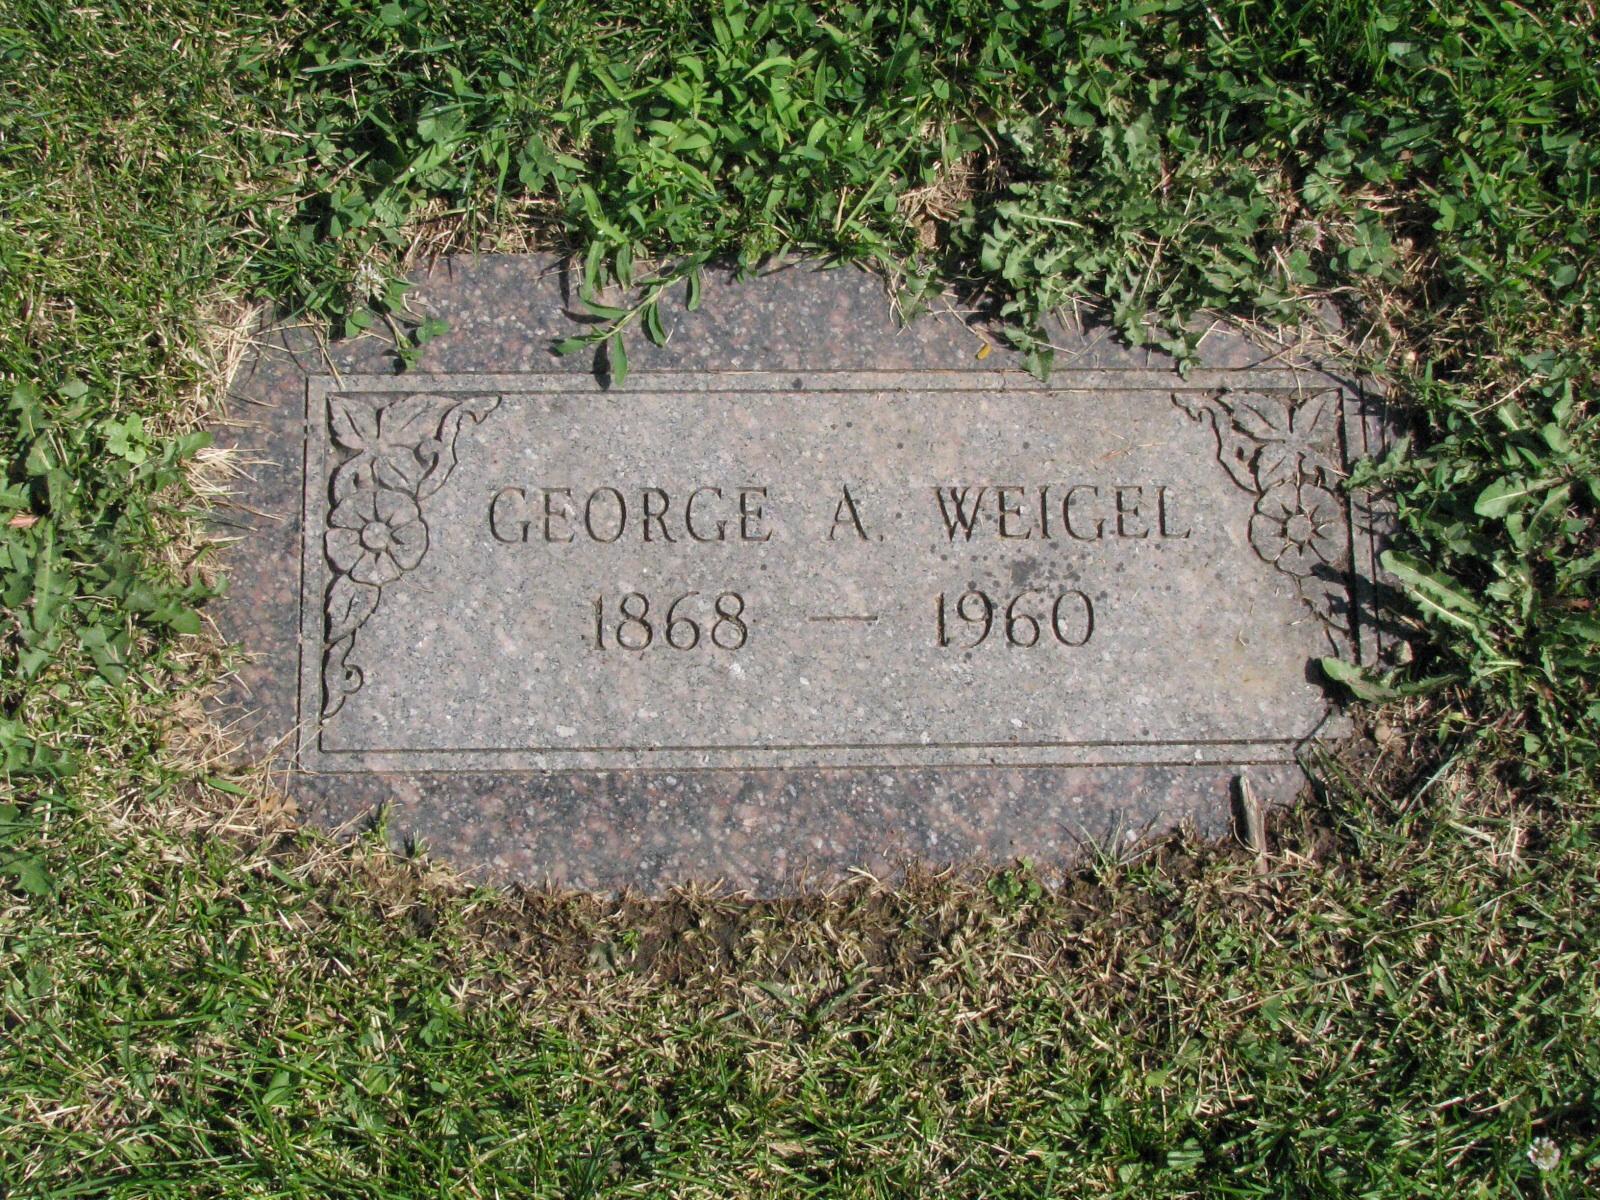 George A Weigel